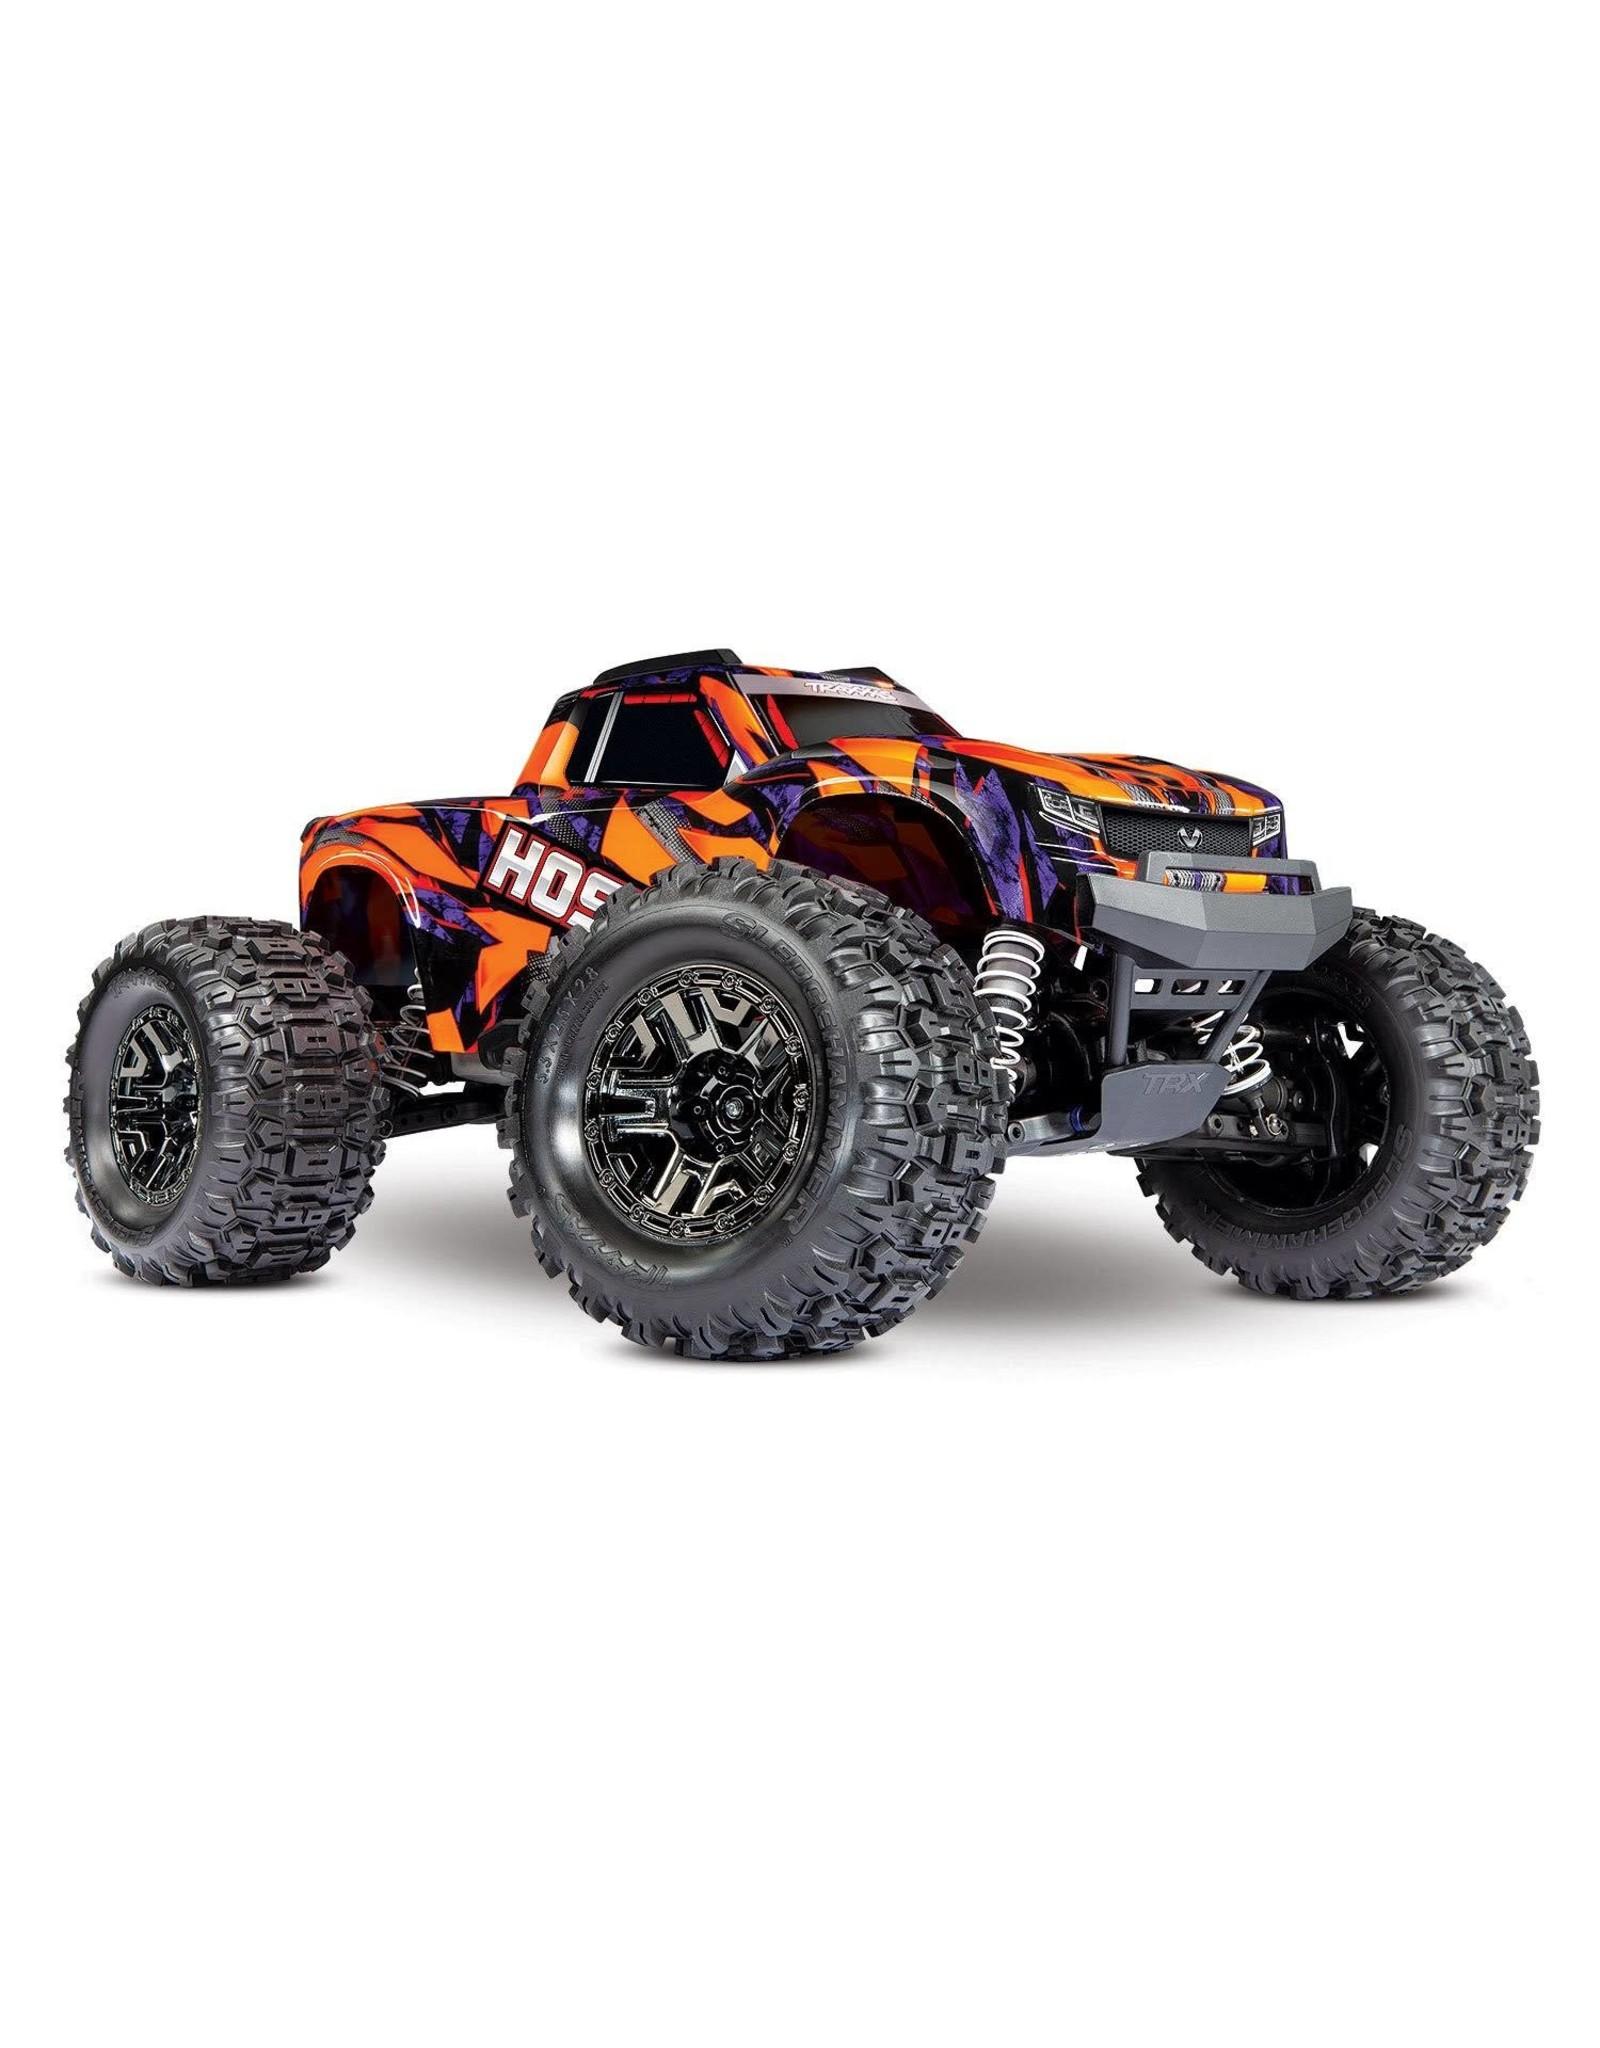 Traxxas Hoss 4X4 VXL: 1/10 Scale 4X4 Monster Truck